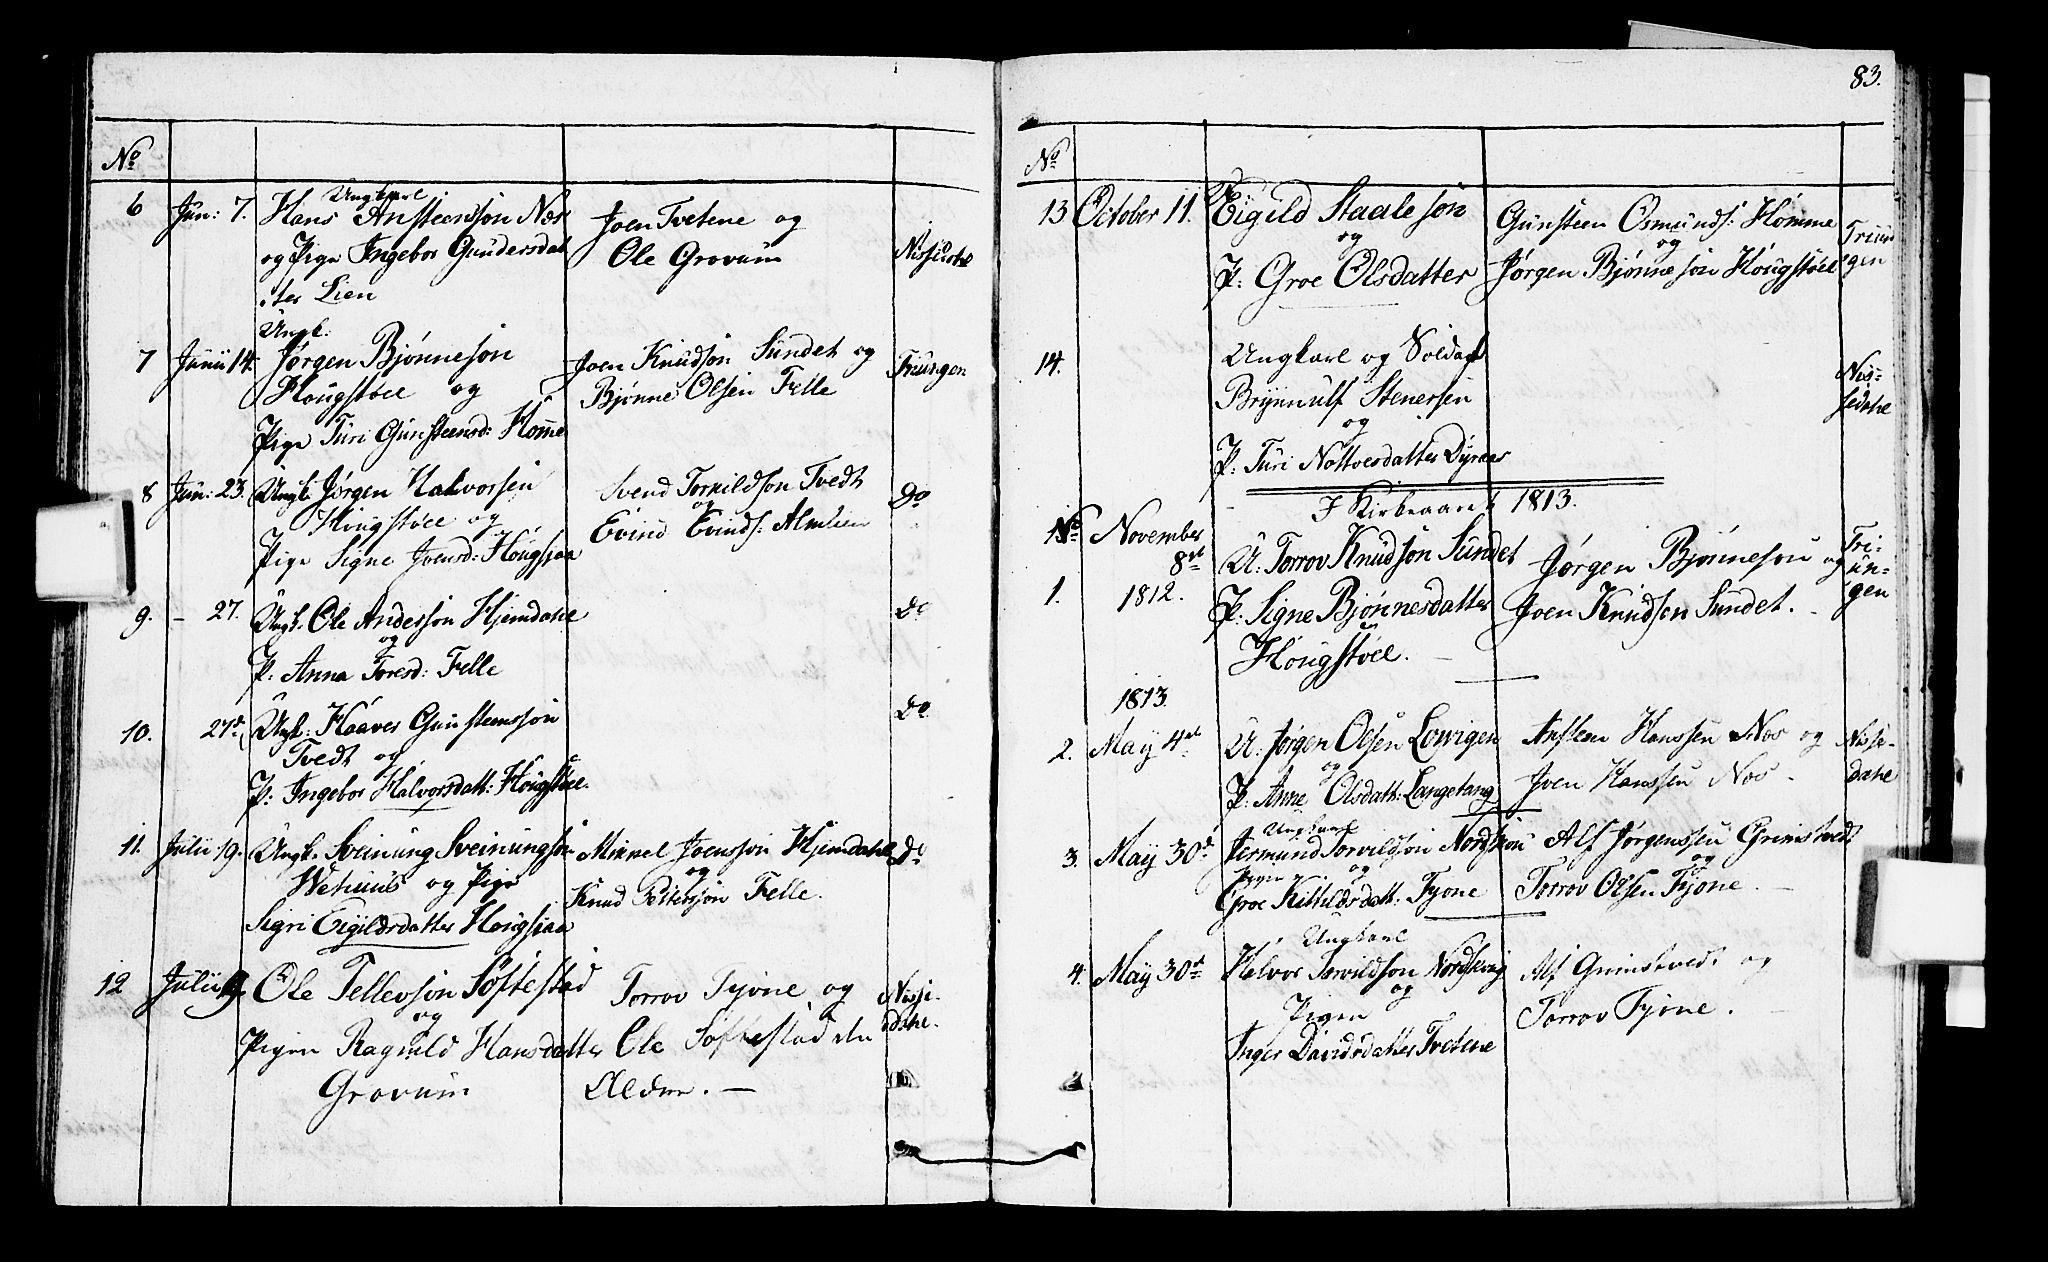 SAKO, Nissedal kirkebøker, F/Fa/L0001: Parish register (official) no. I 1, 1811-1814, p. 83